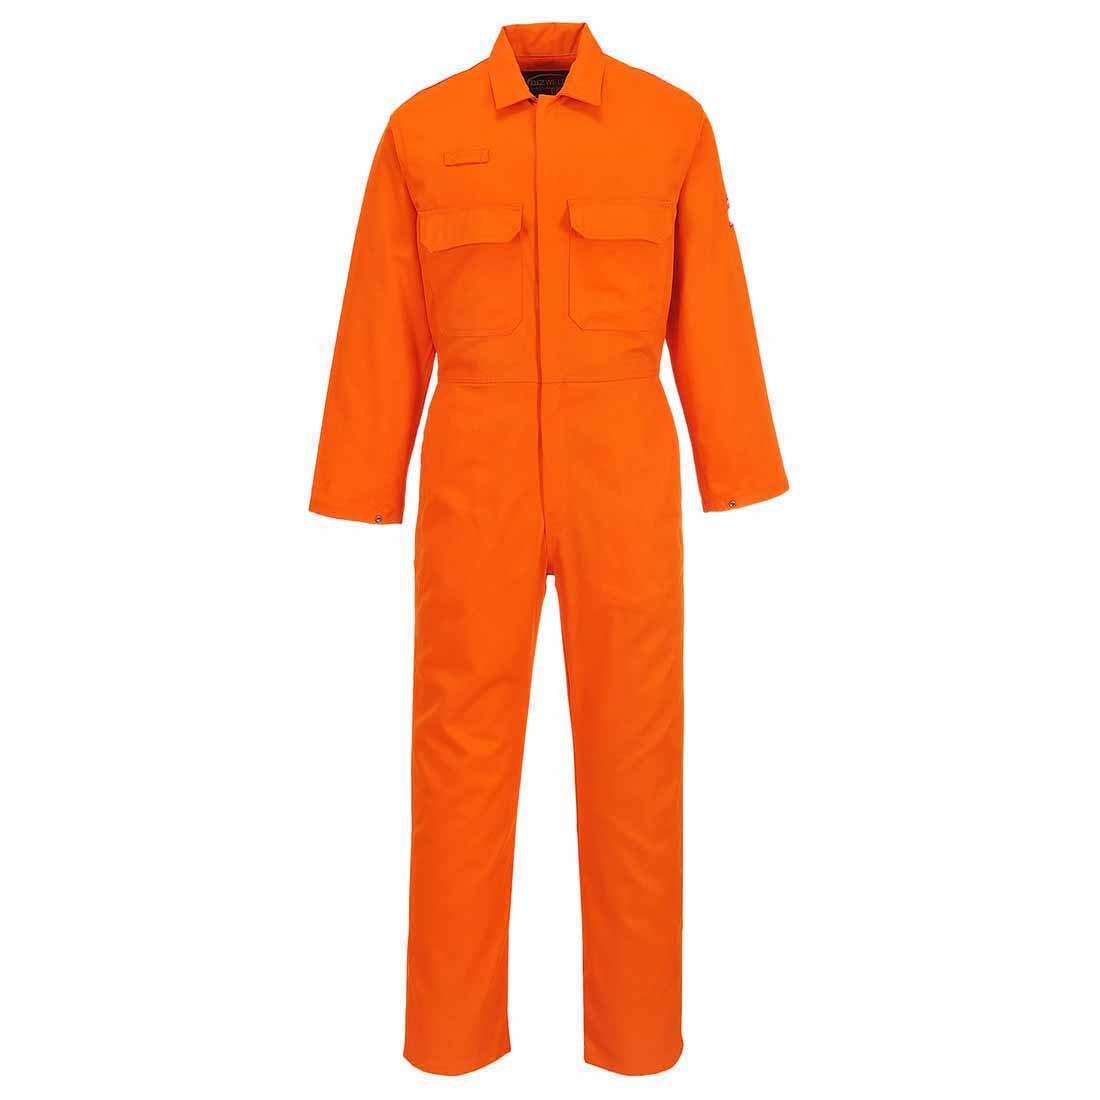 Portwest BIZ1ORRXXL Bizweld Flame Resistant Coverall Size: XX-Large Regular Orange